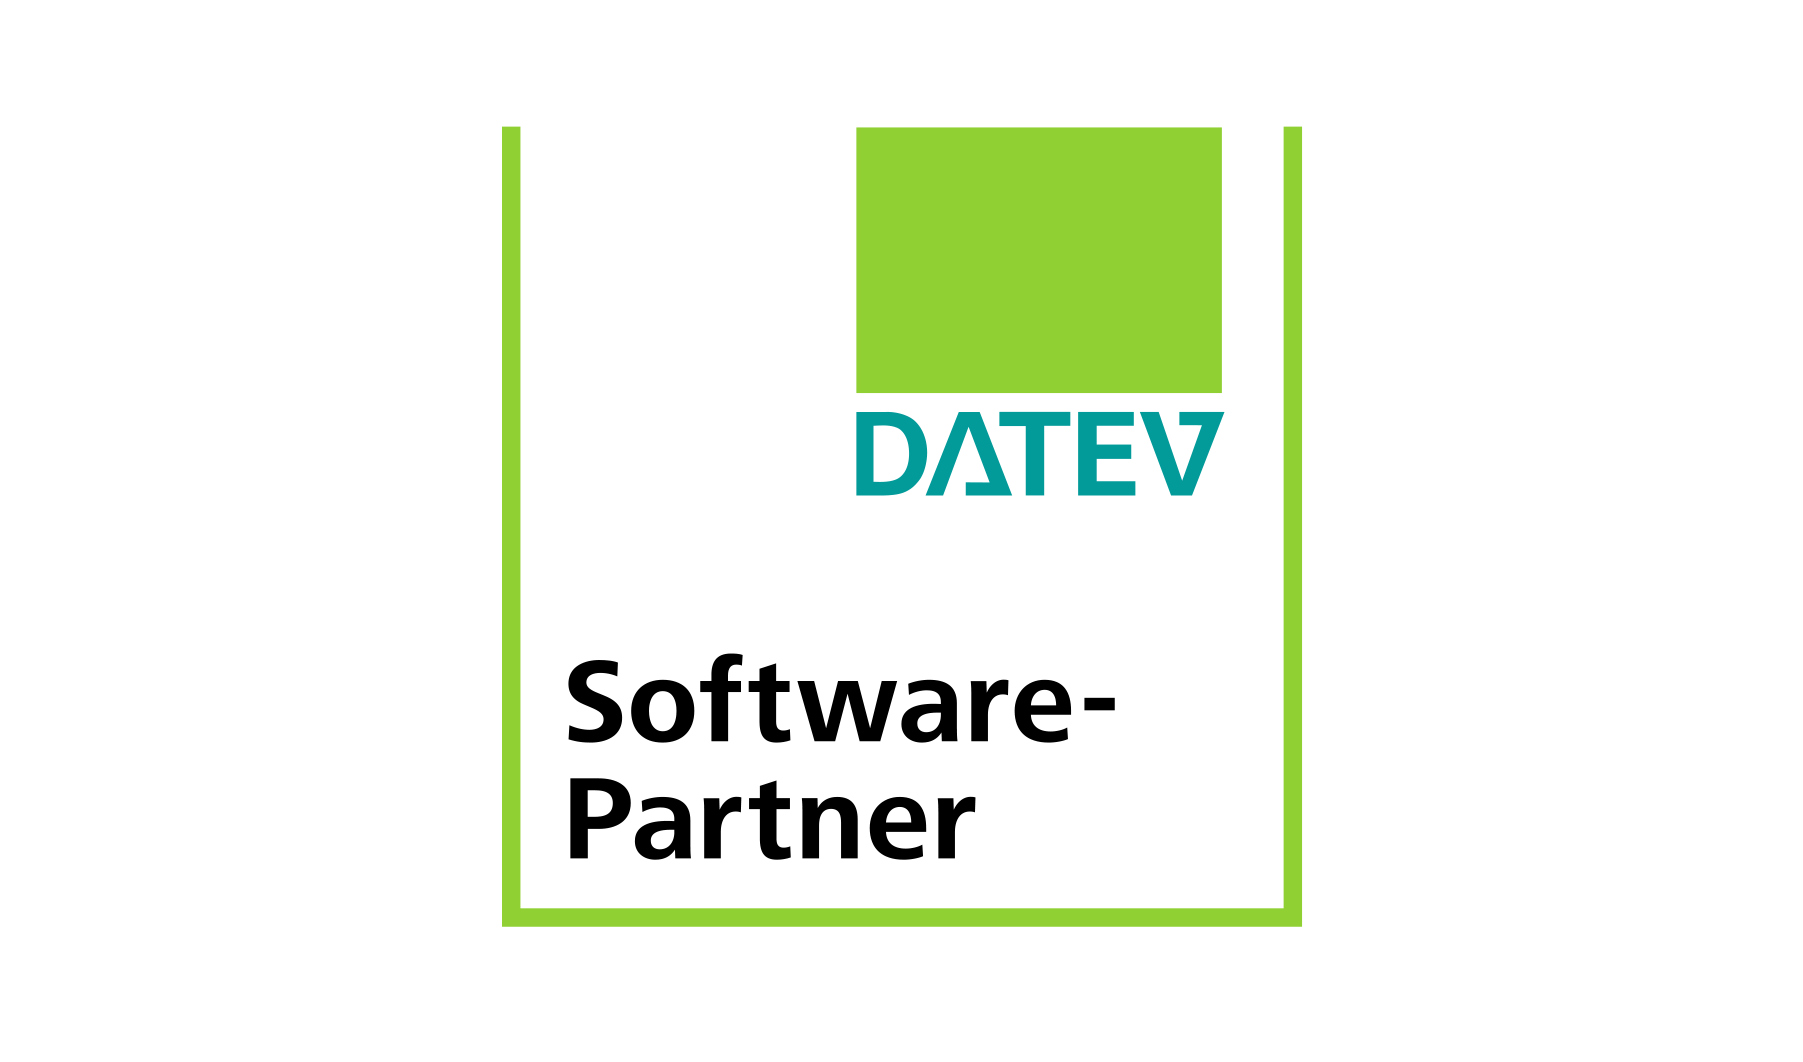 We are DATEV-Software-Partner